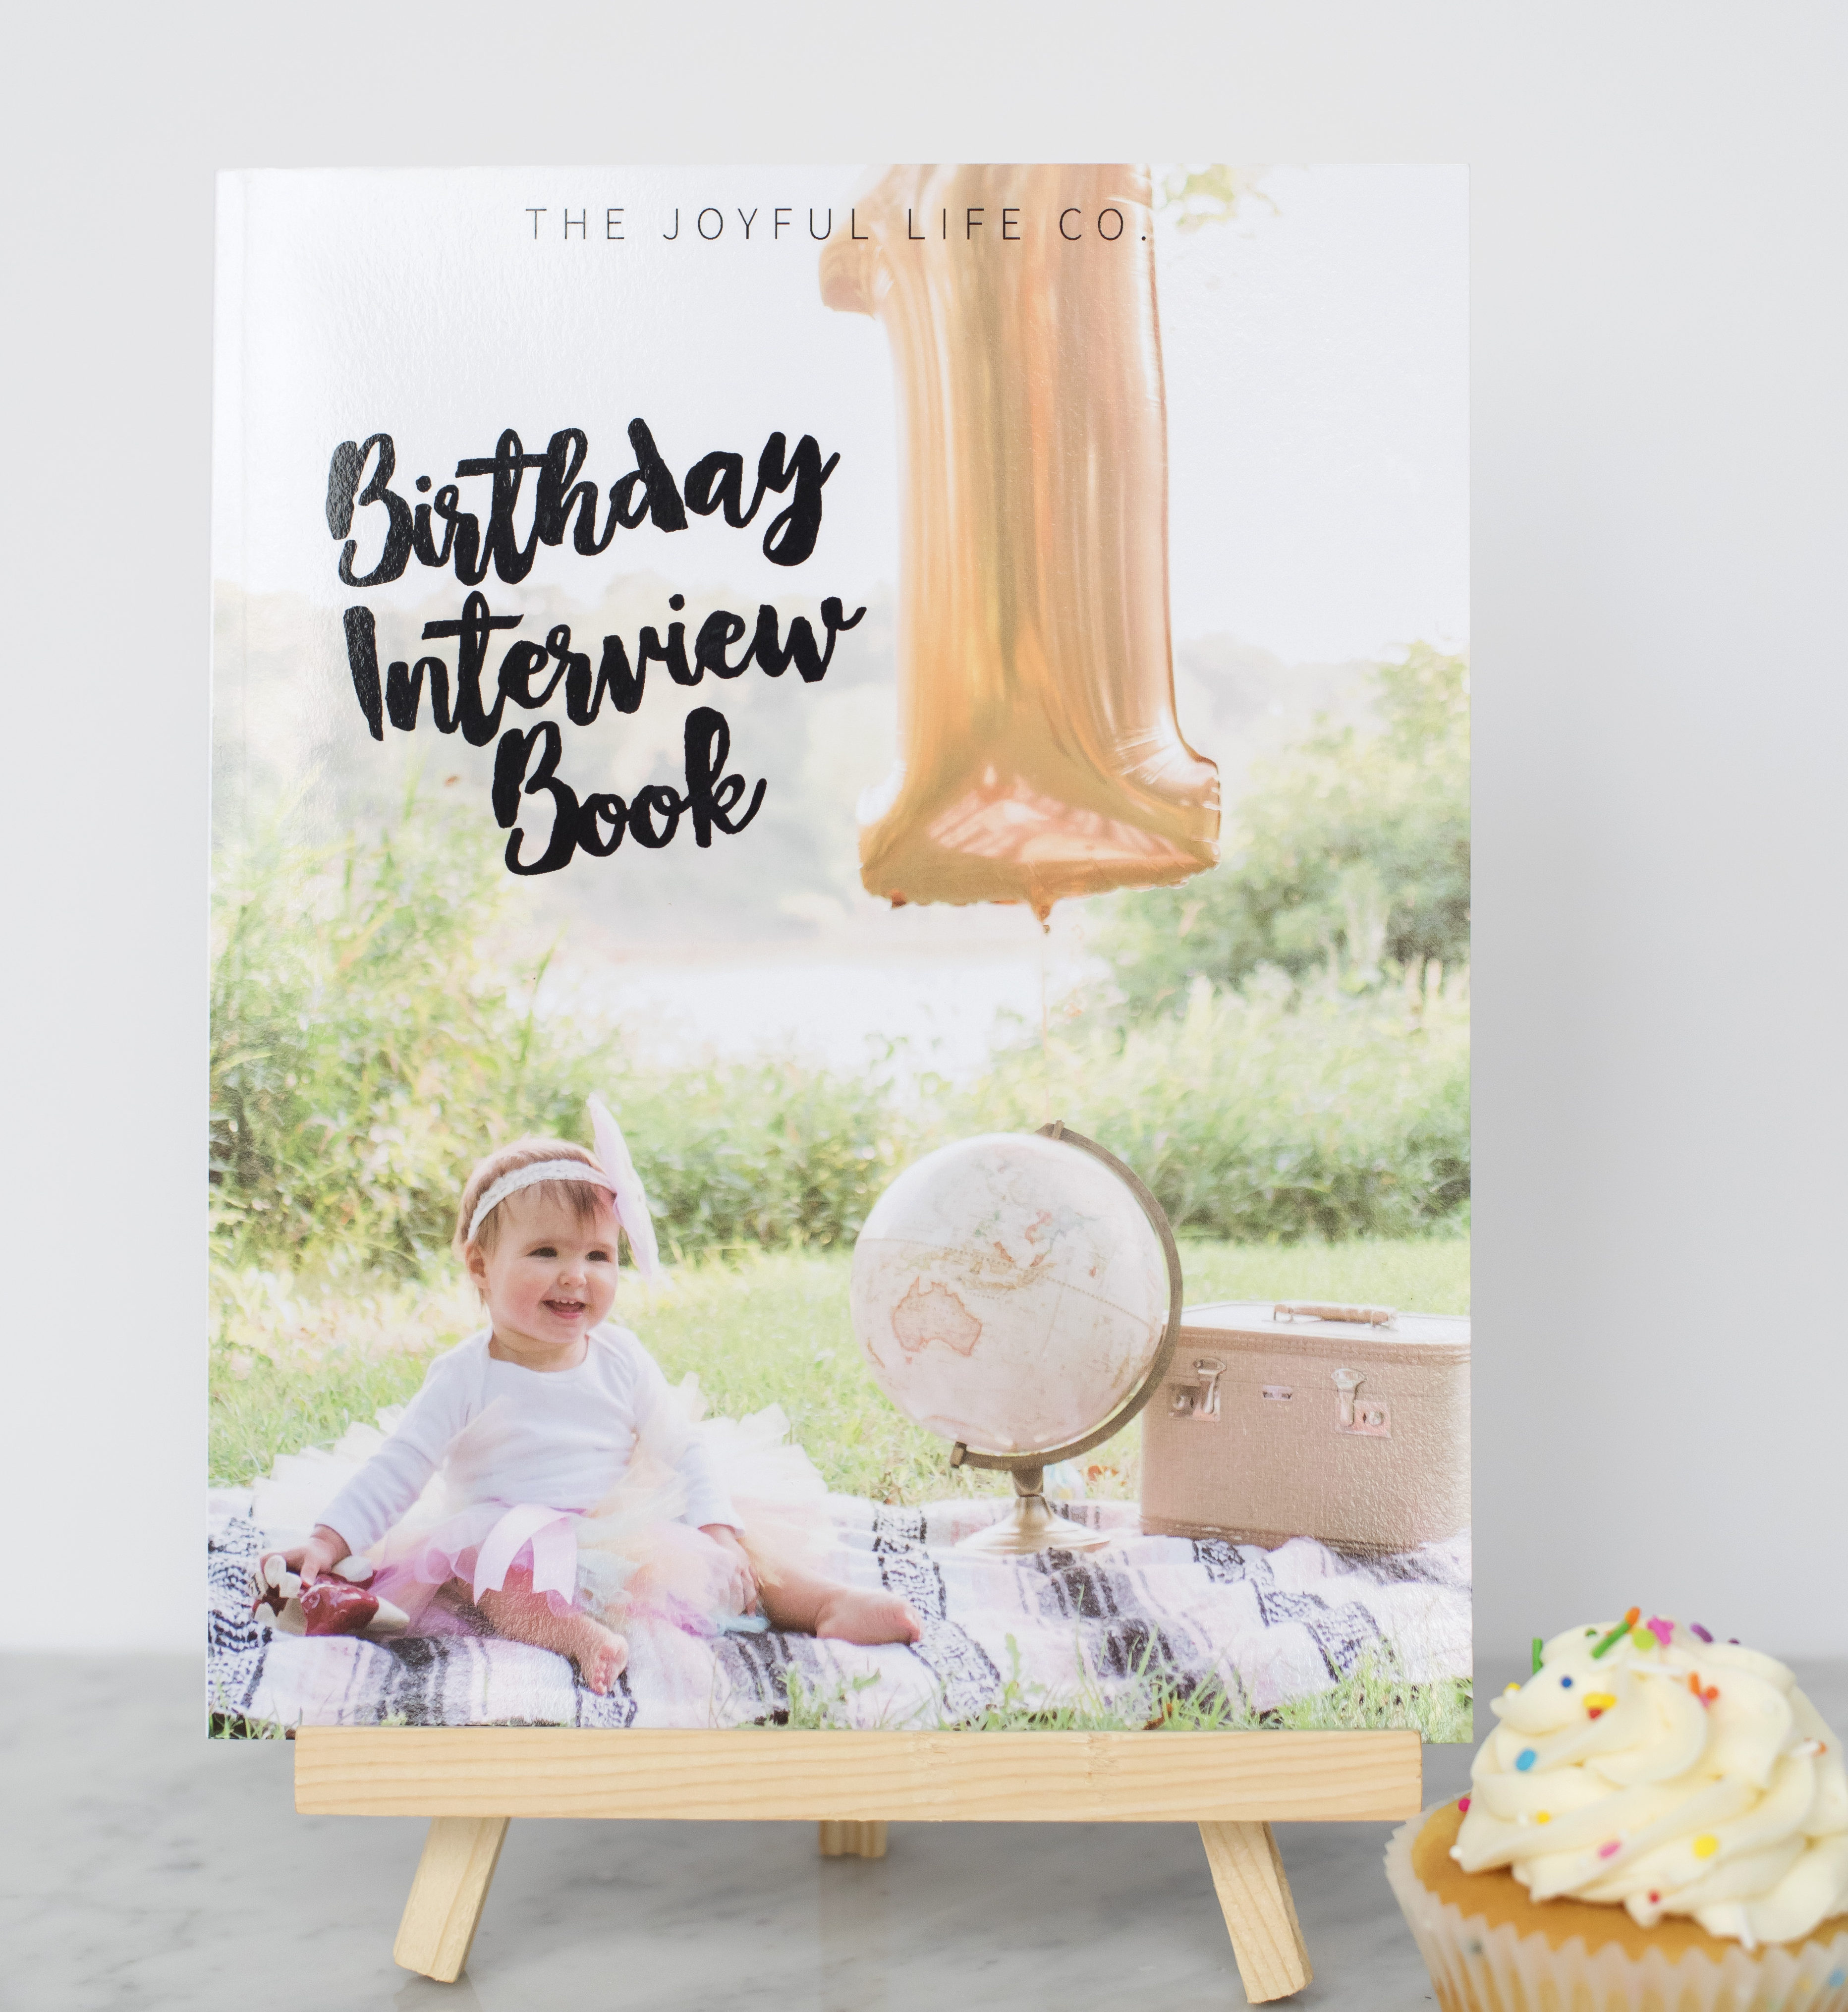 Custom Birthday Interview Book